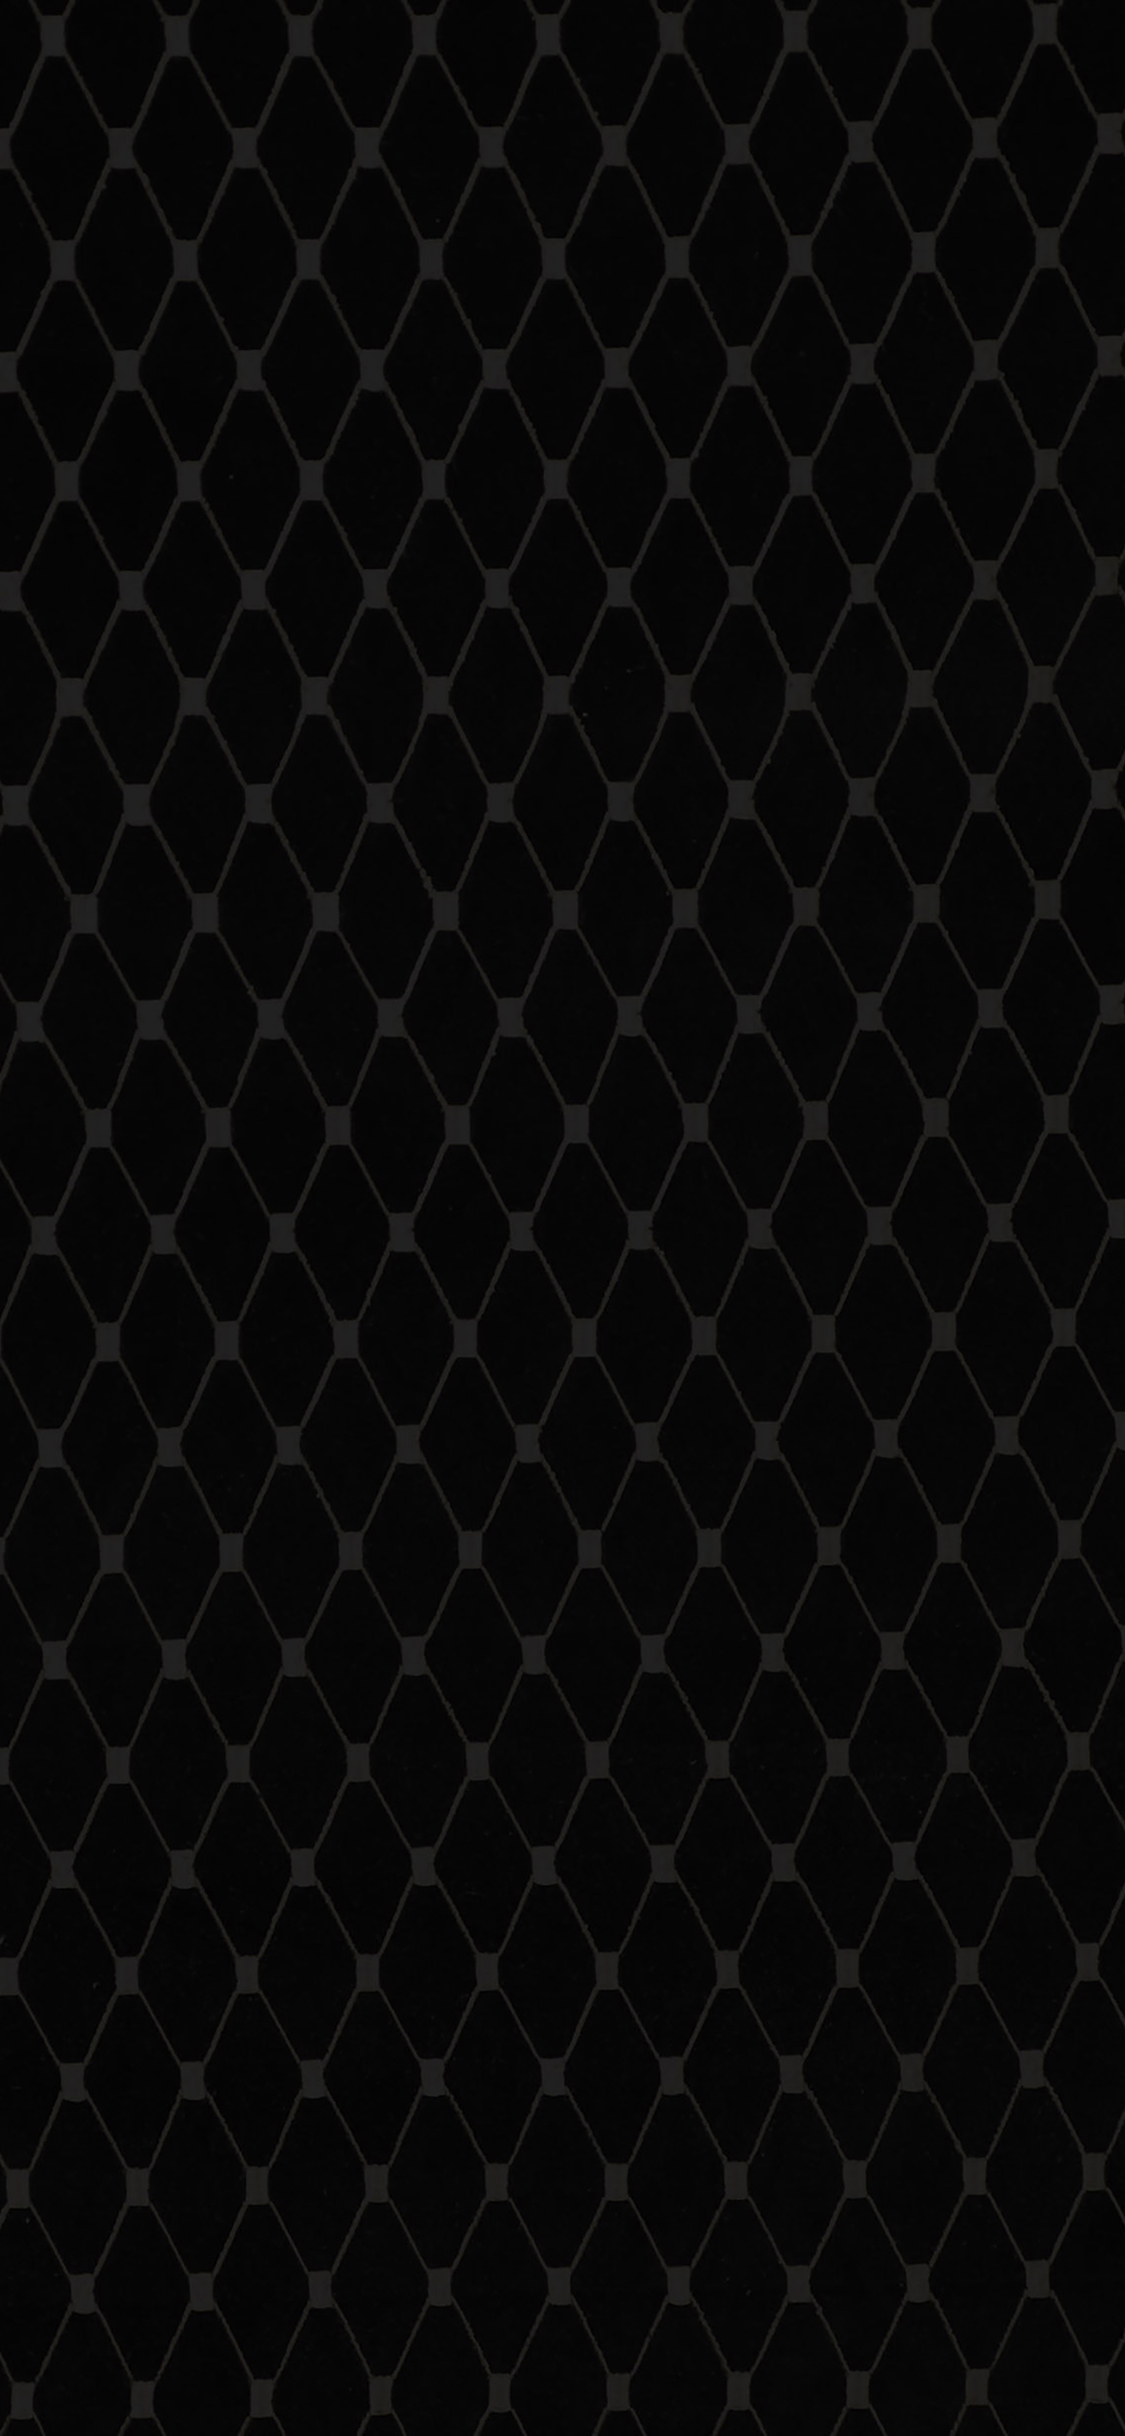 Mesh line dark pattern iPhone X wallpaper